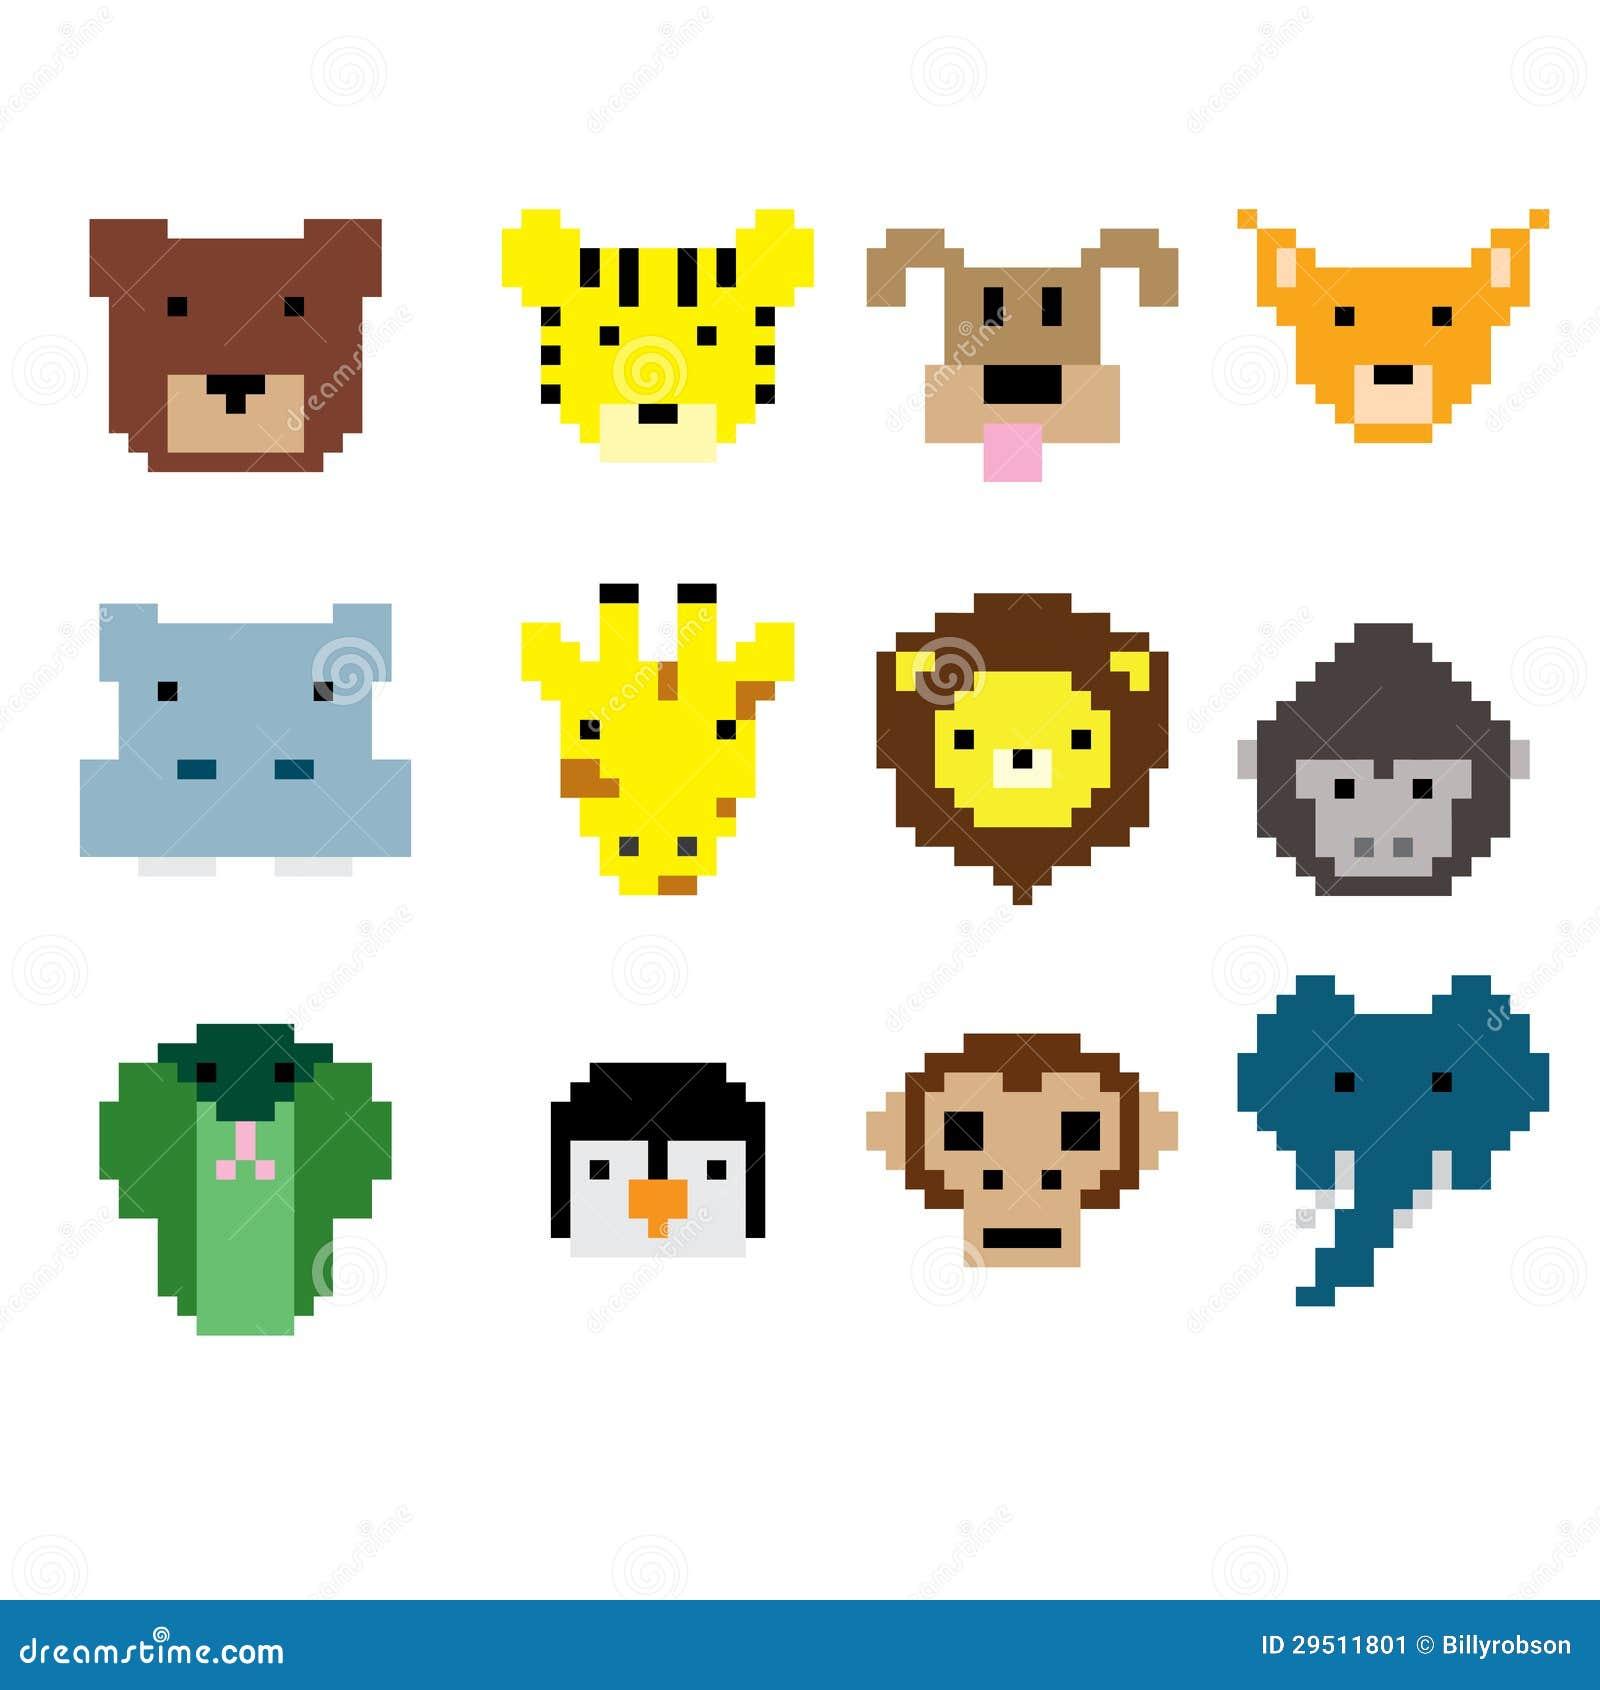 Pixel Art Animal Faces Stock Vector. Illustration Of